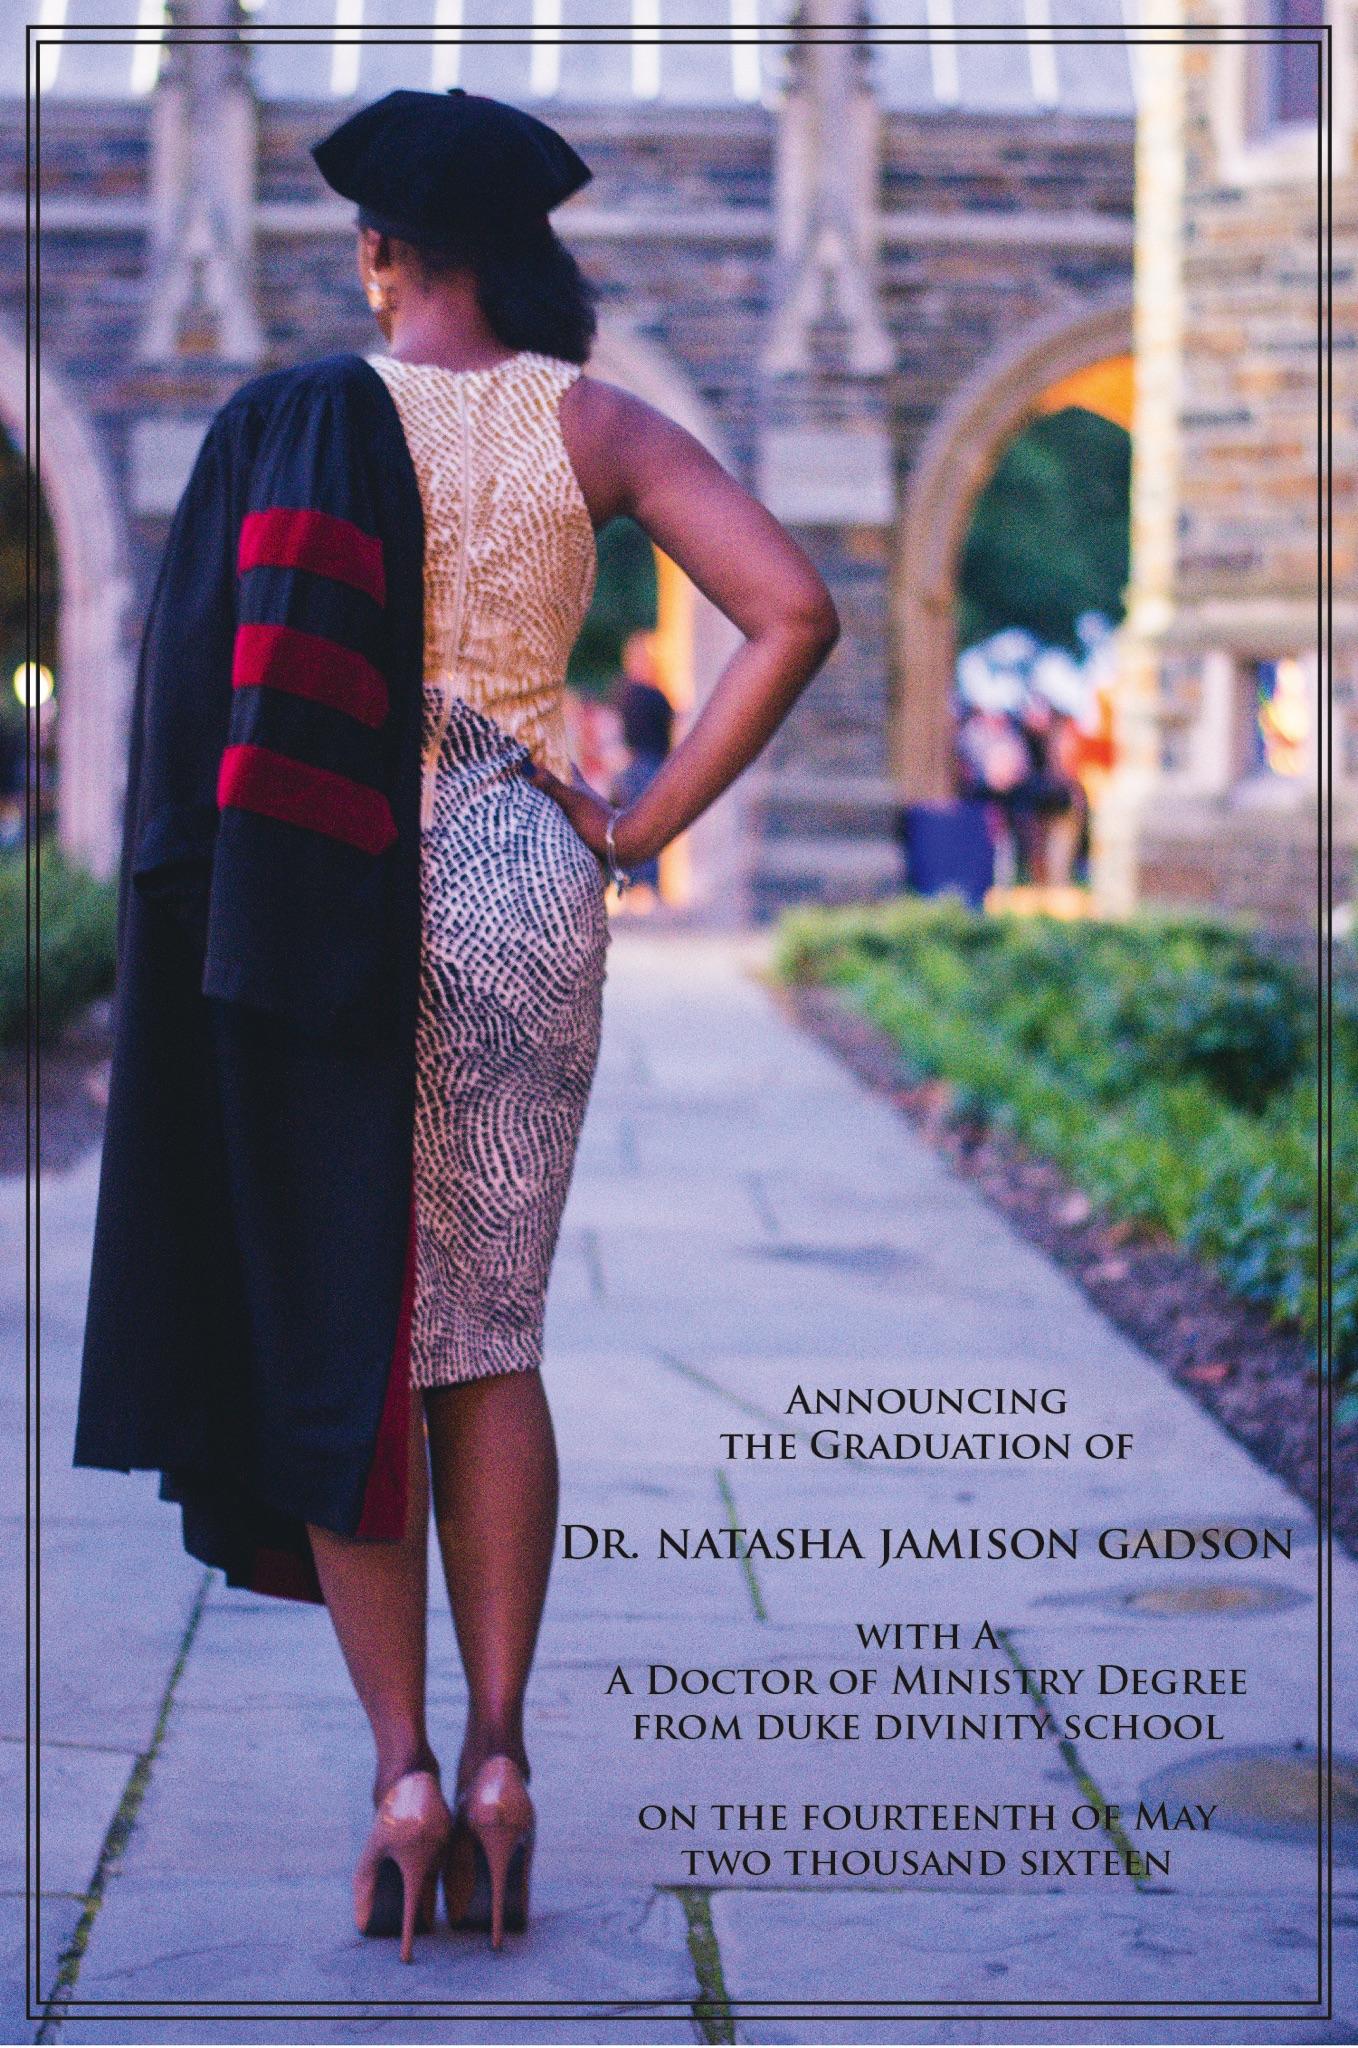 proudly introducing...Dr. Natasha Jamison Gadson -